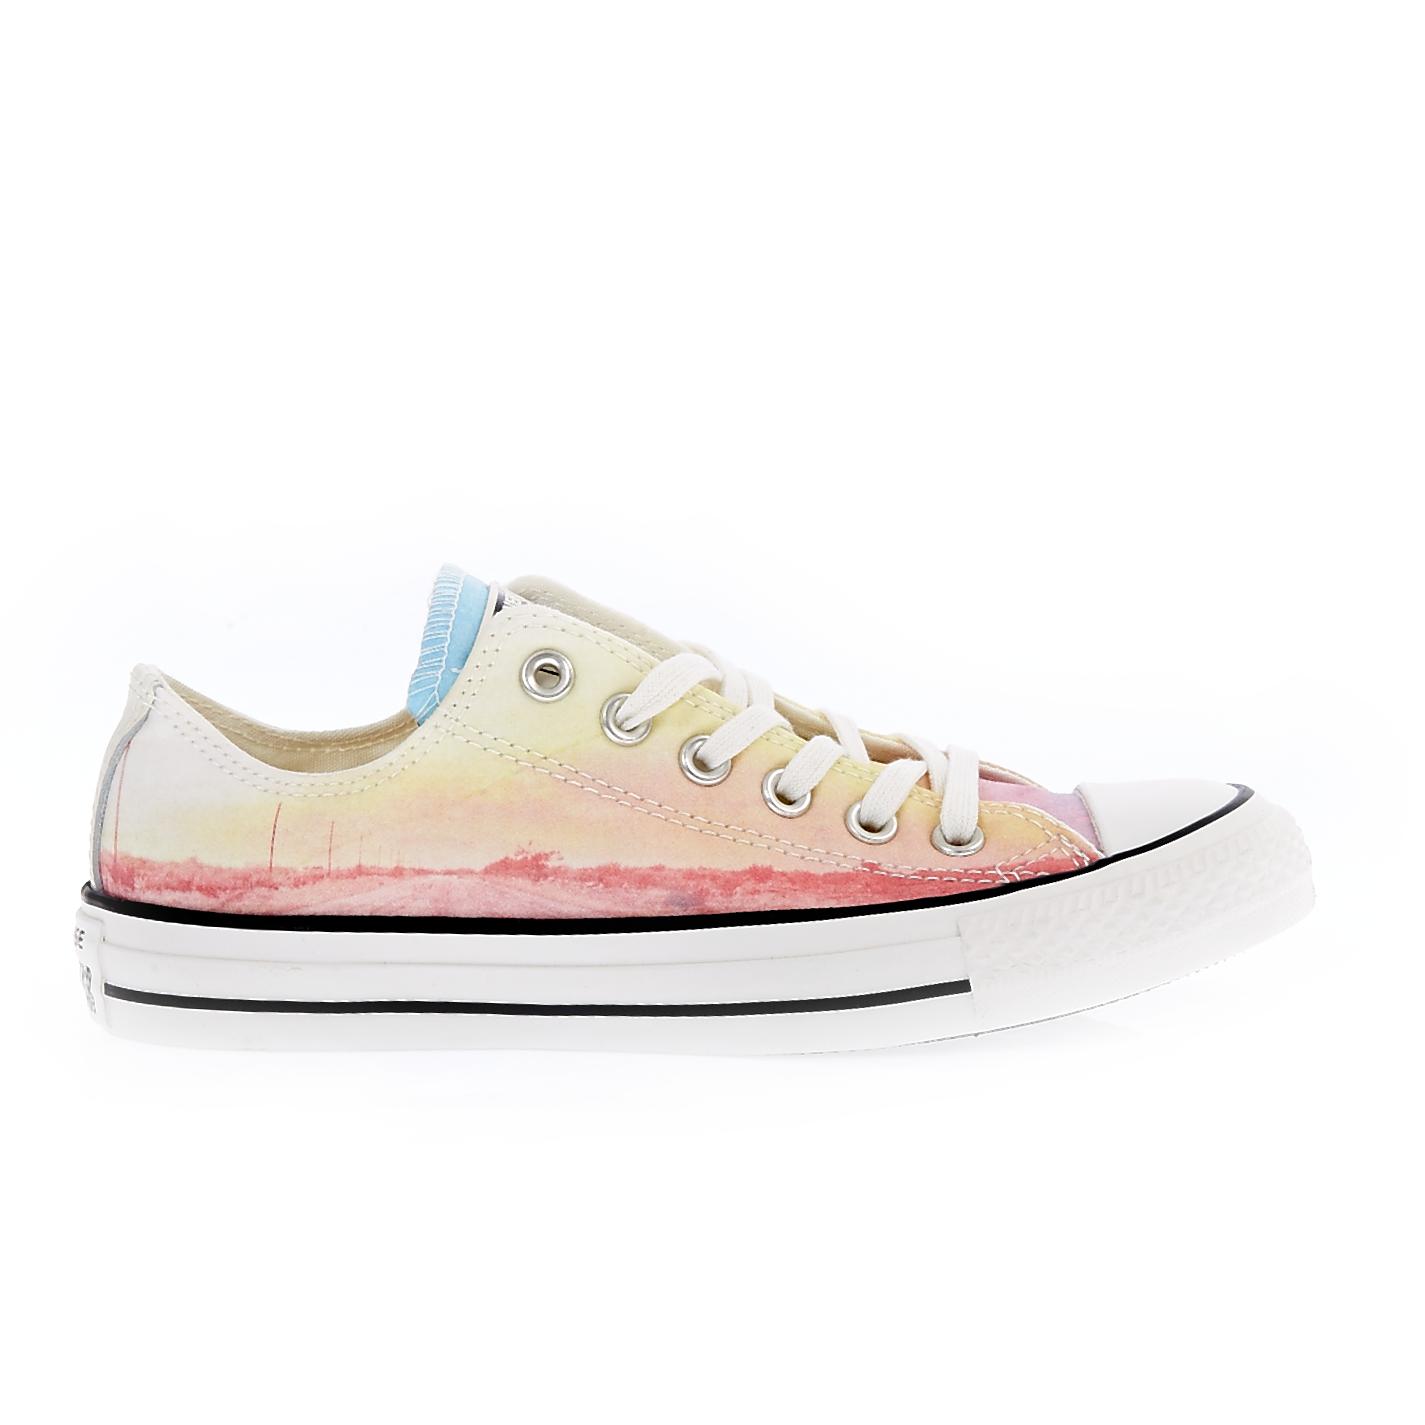 CONVERSE – Γυναικεία παπούτσια Chuck Taylor All Star Ox κίτρινα-ροζ